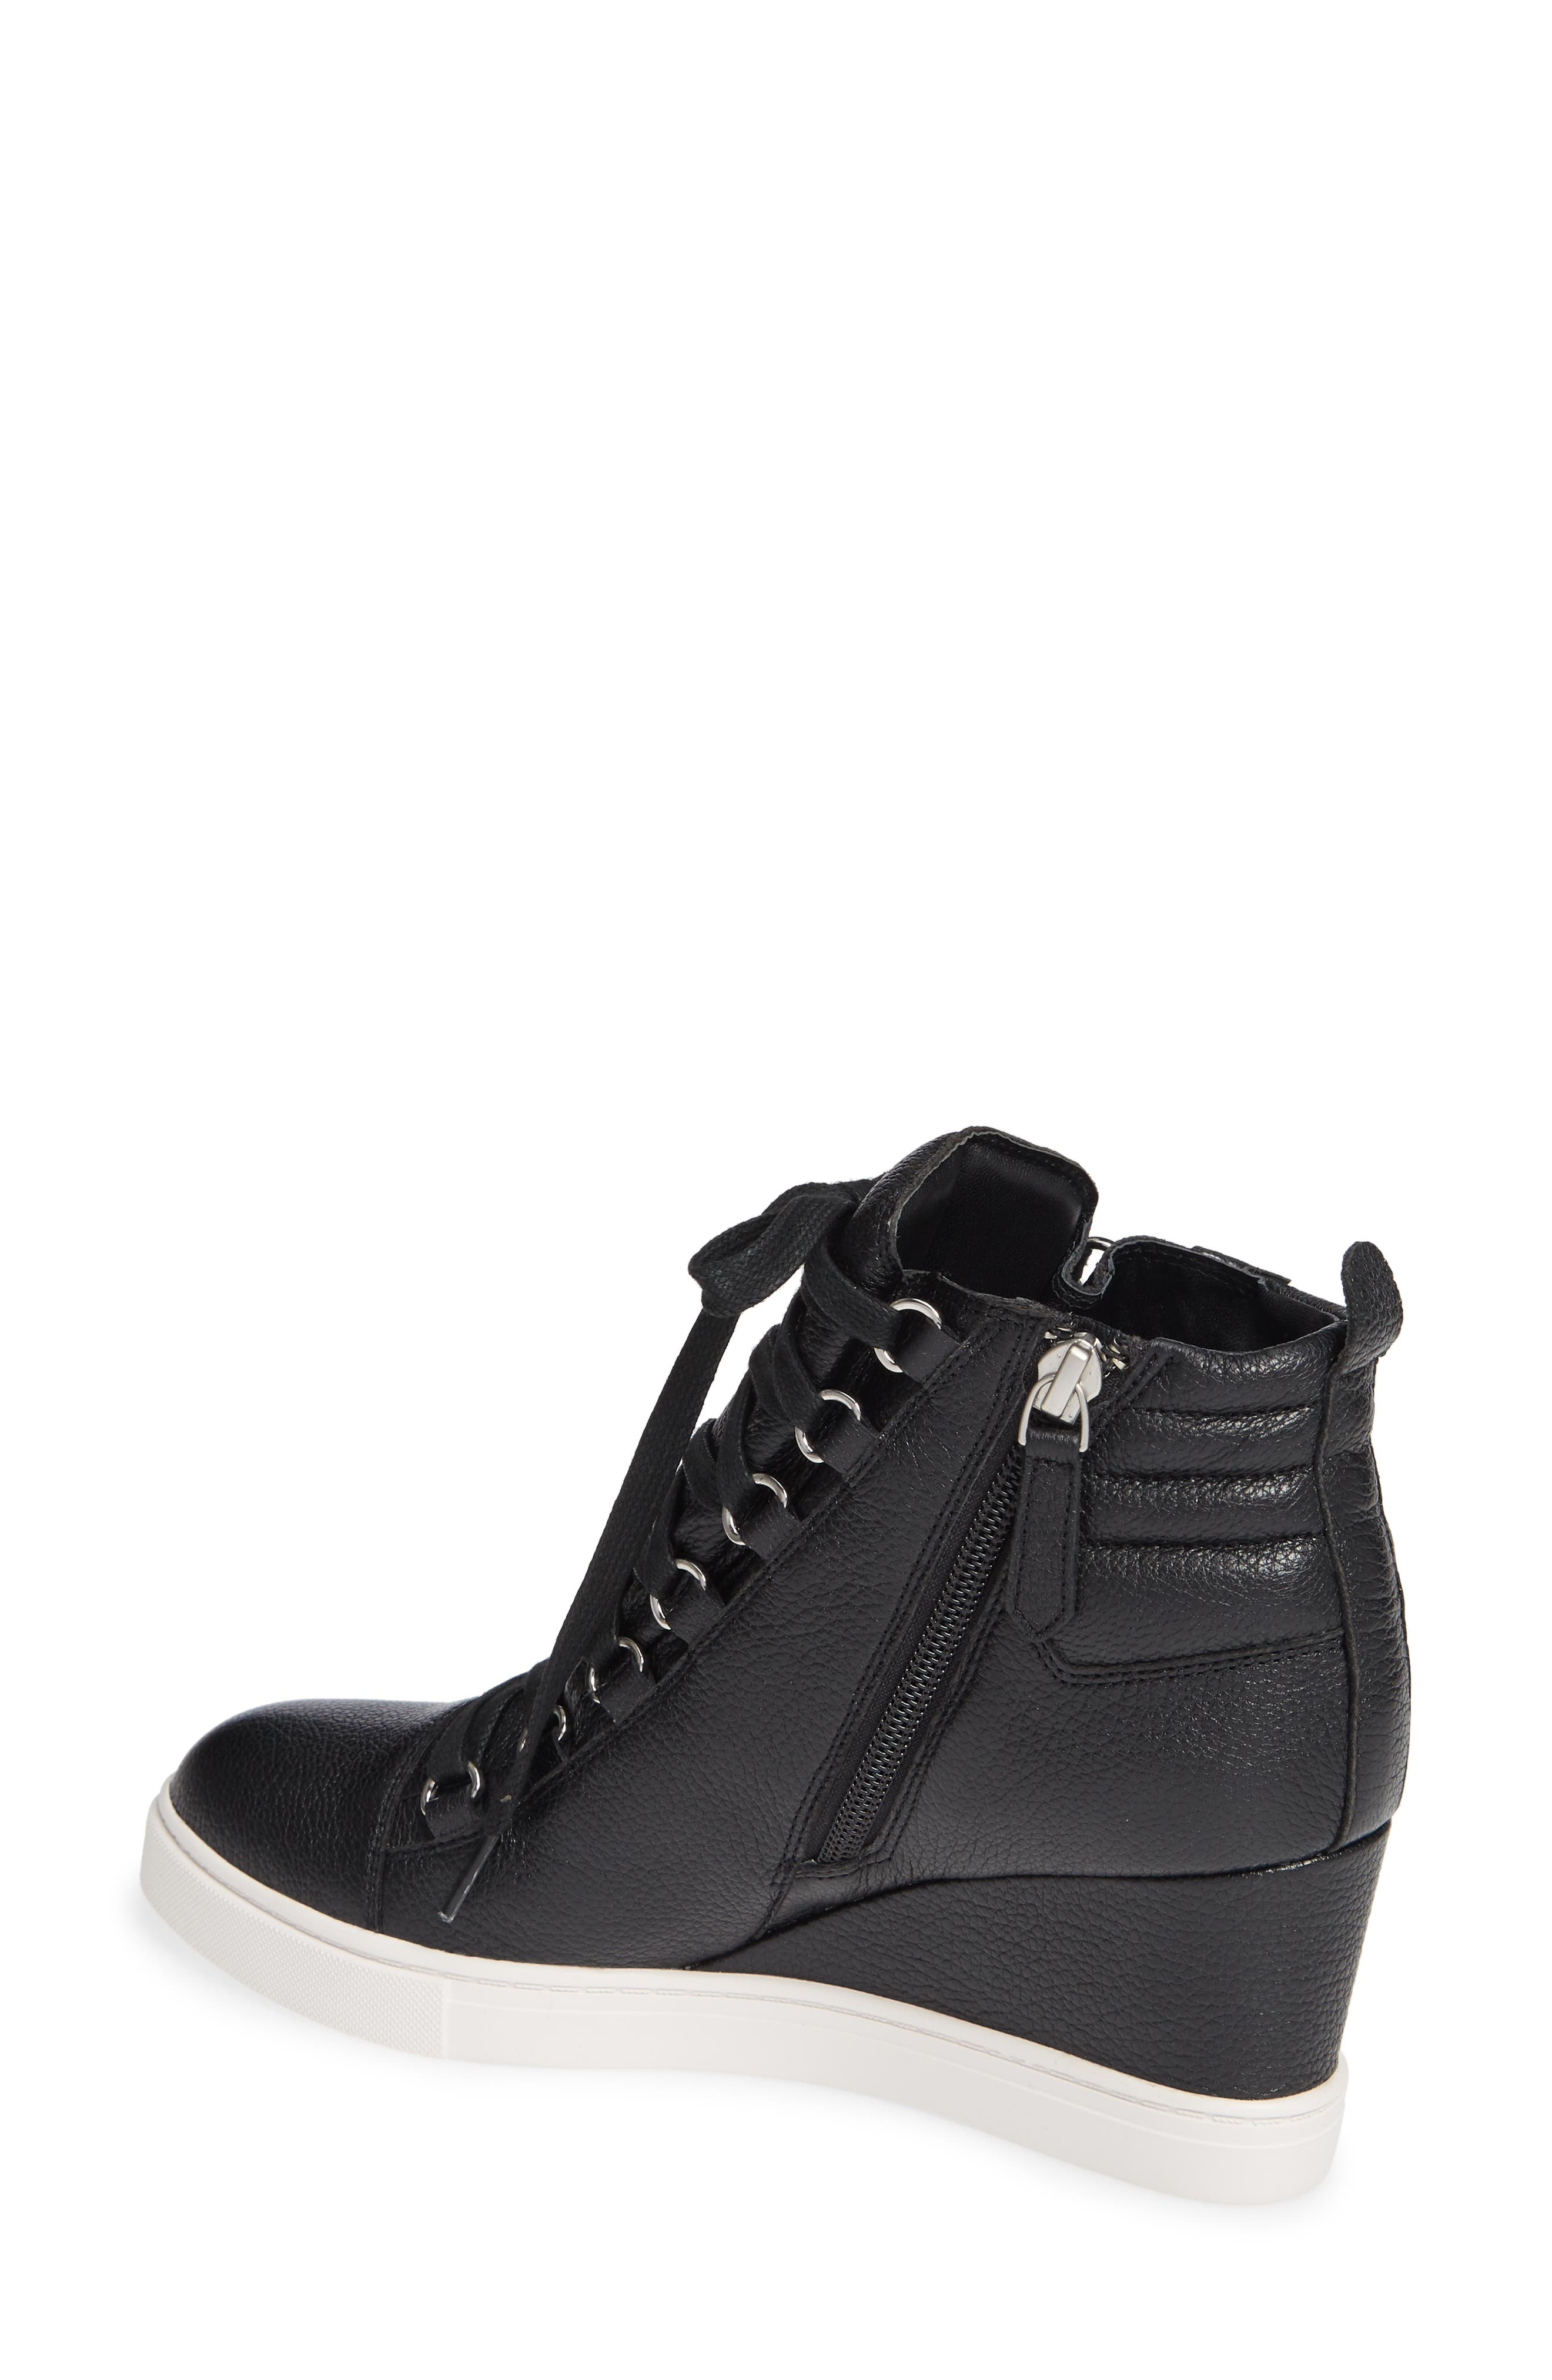 LINEA PAOLO, Fenton Wedge Sneaker, Alternate thumbnail 2, color, BLACK TUMBLED LEATHER